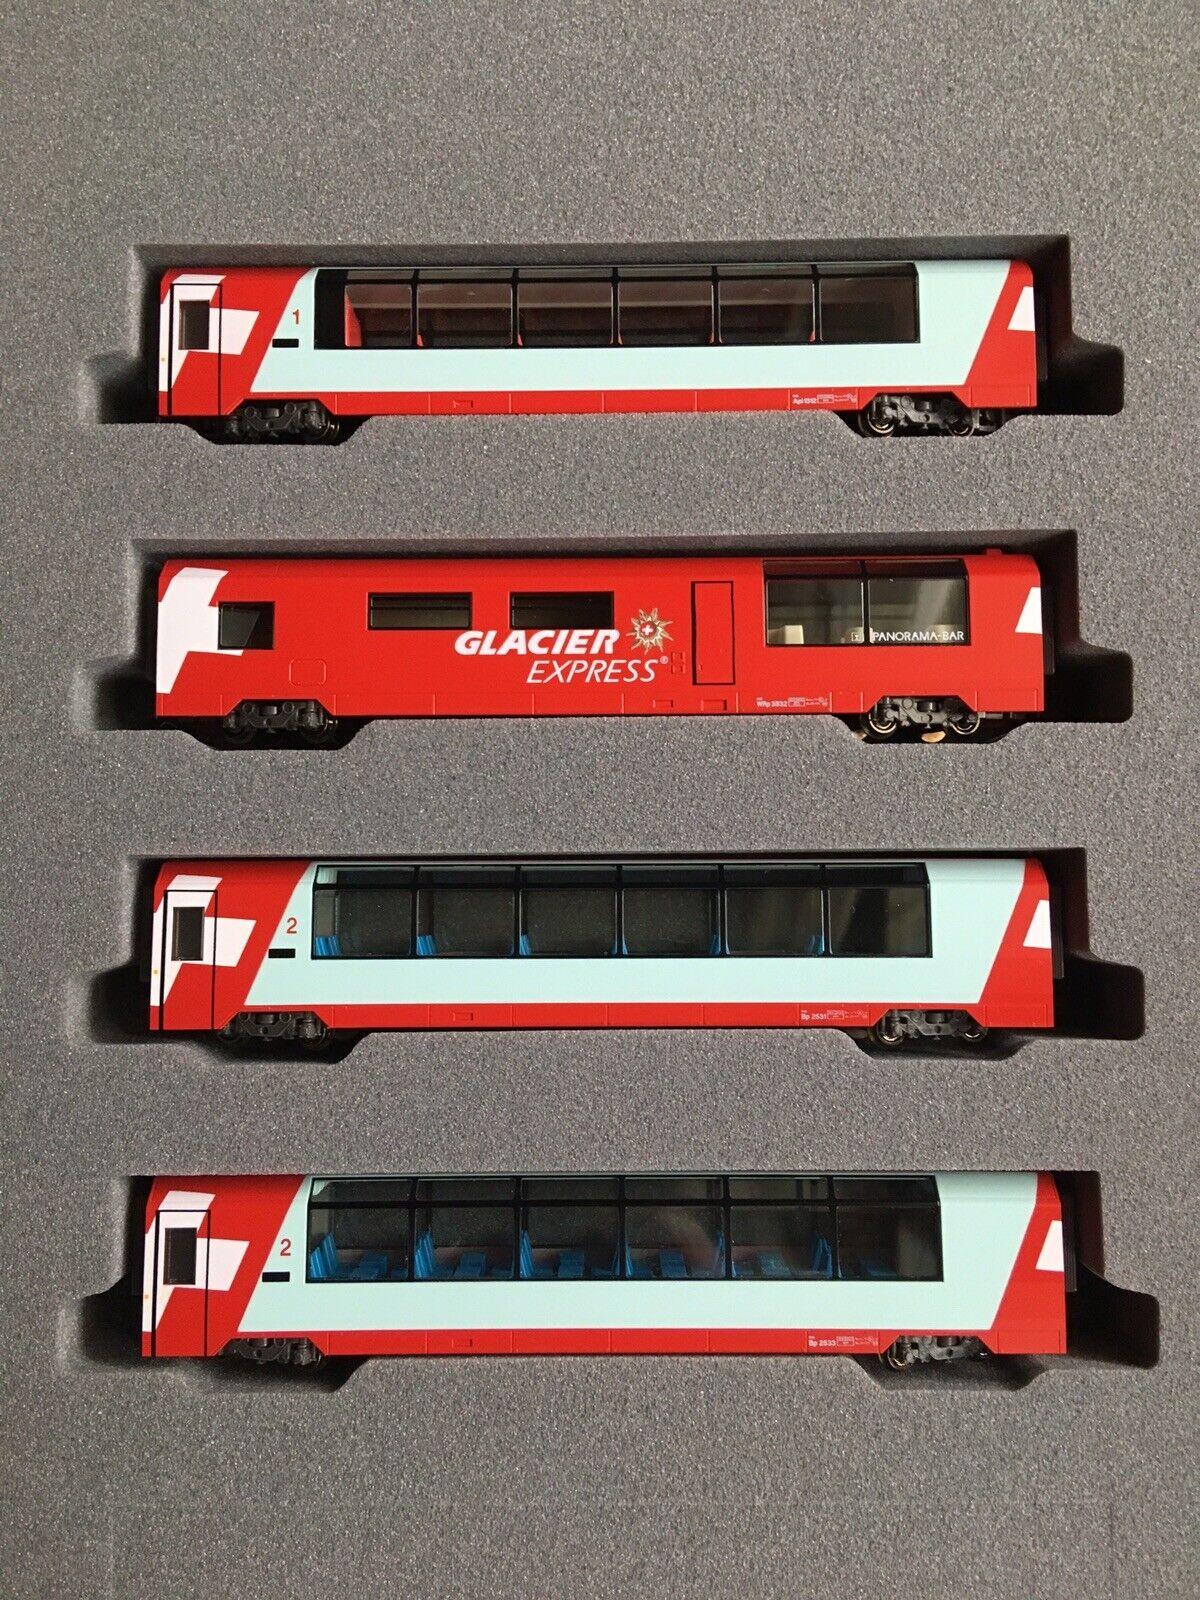 Kato 10-1146 - Glacier Express - 4pcs Extension set-N gauge